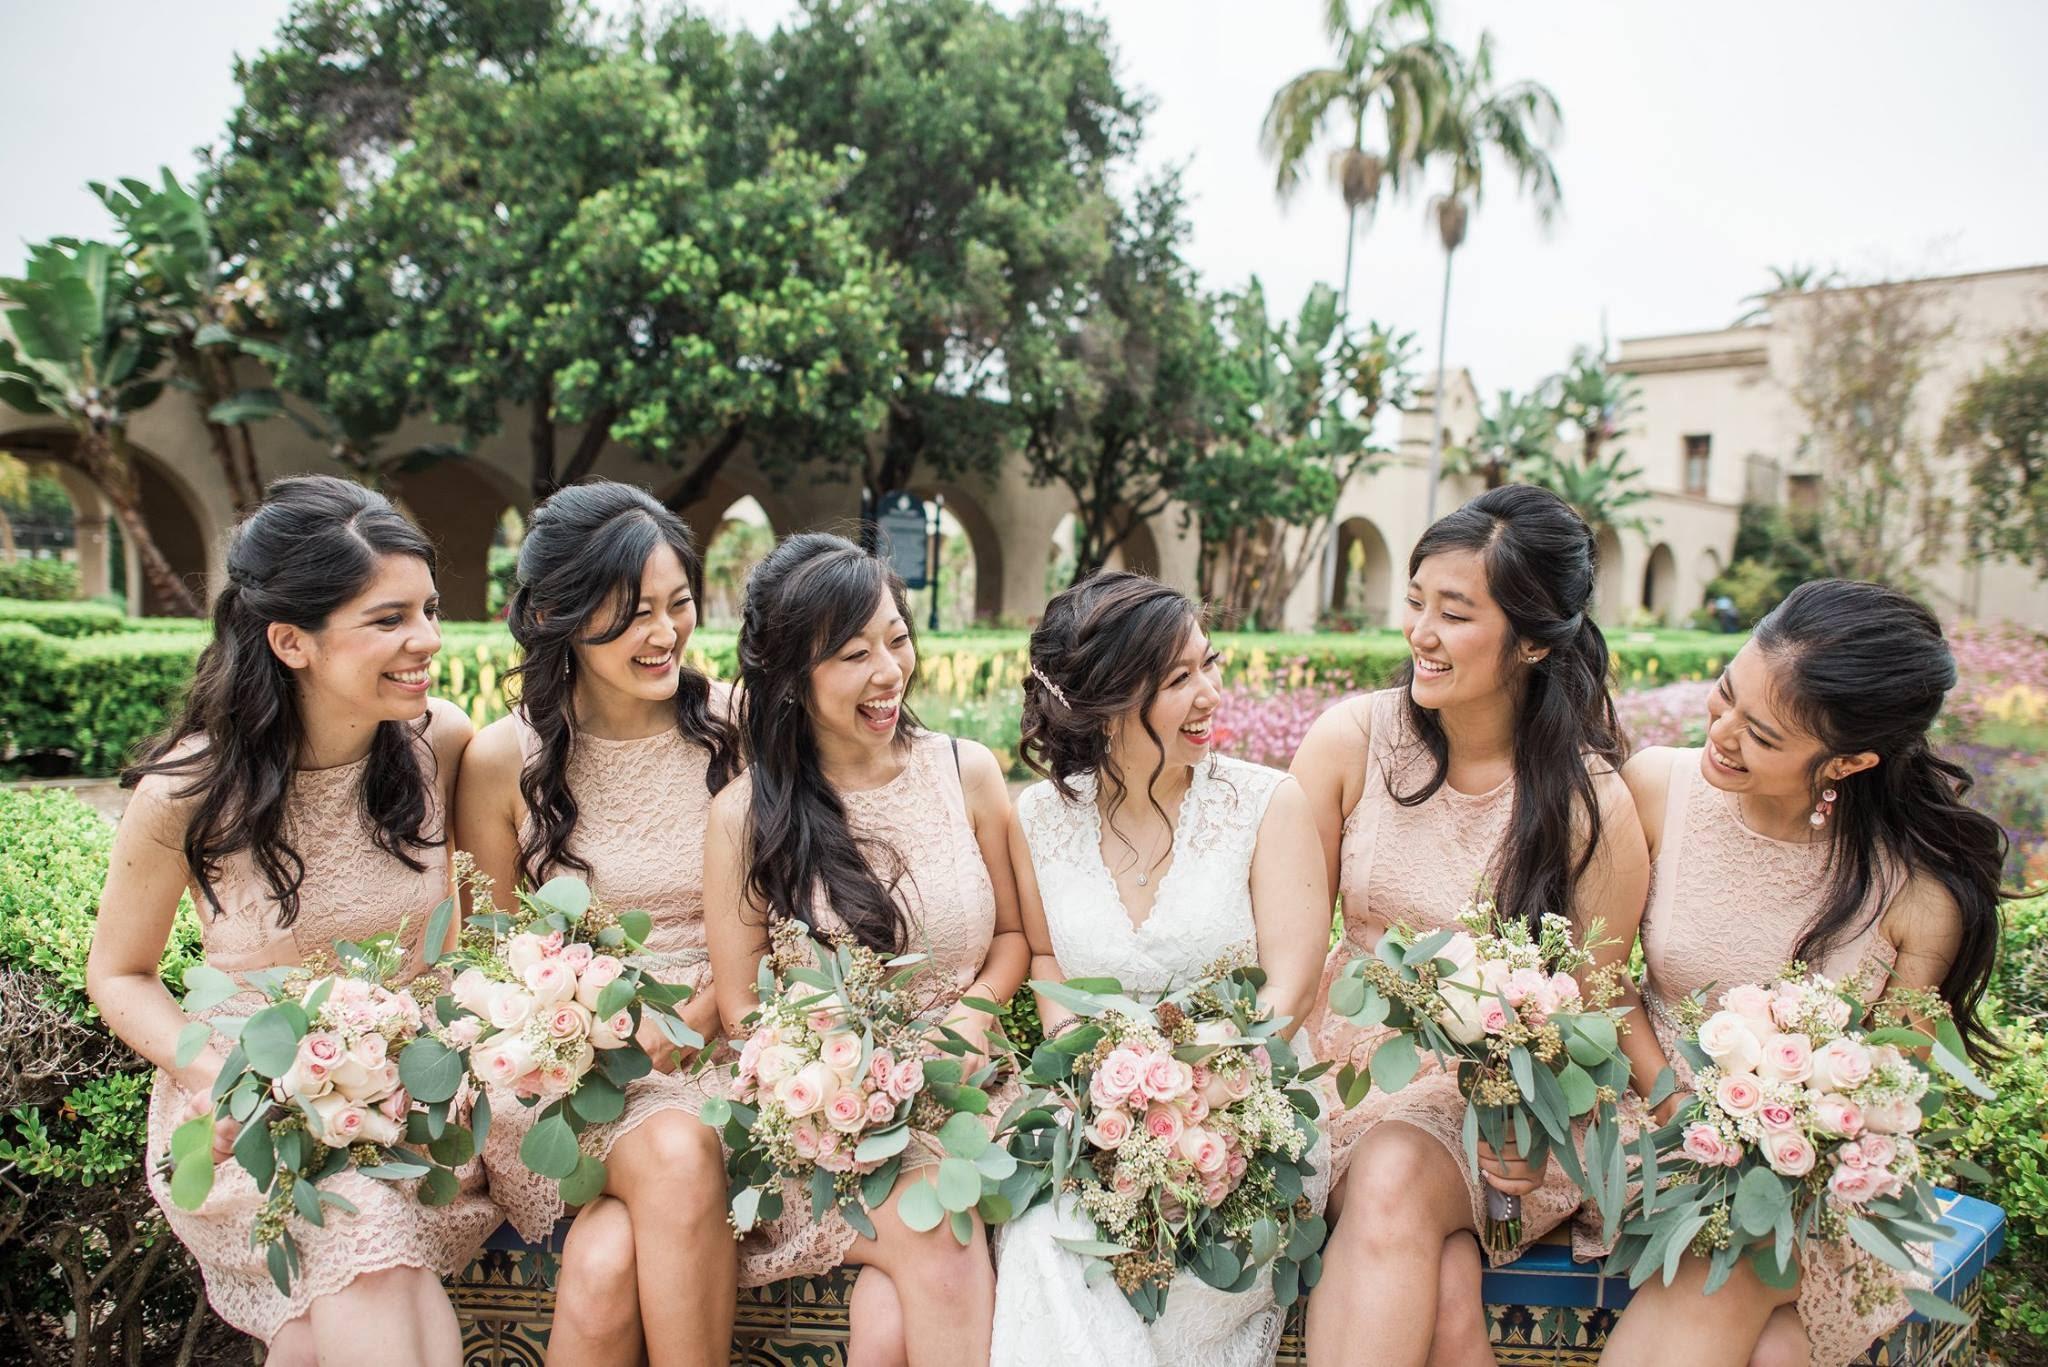 Andy & Esther - Wedding Florals - Floral Design - Ashley Hur - Hip Hip Hooray Dot Love